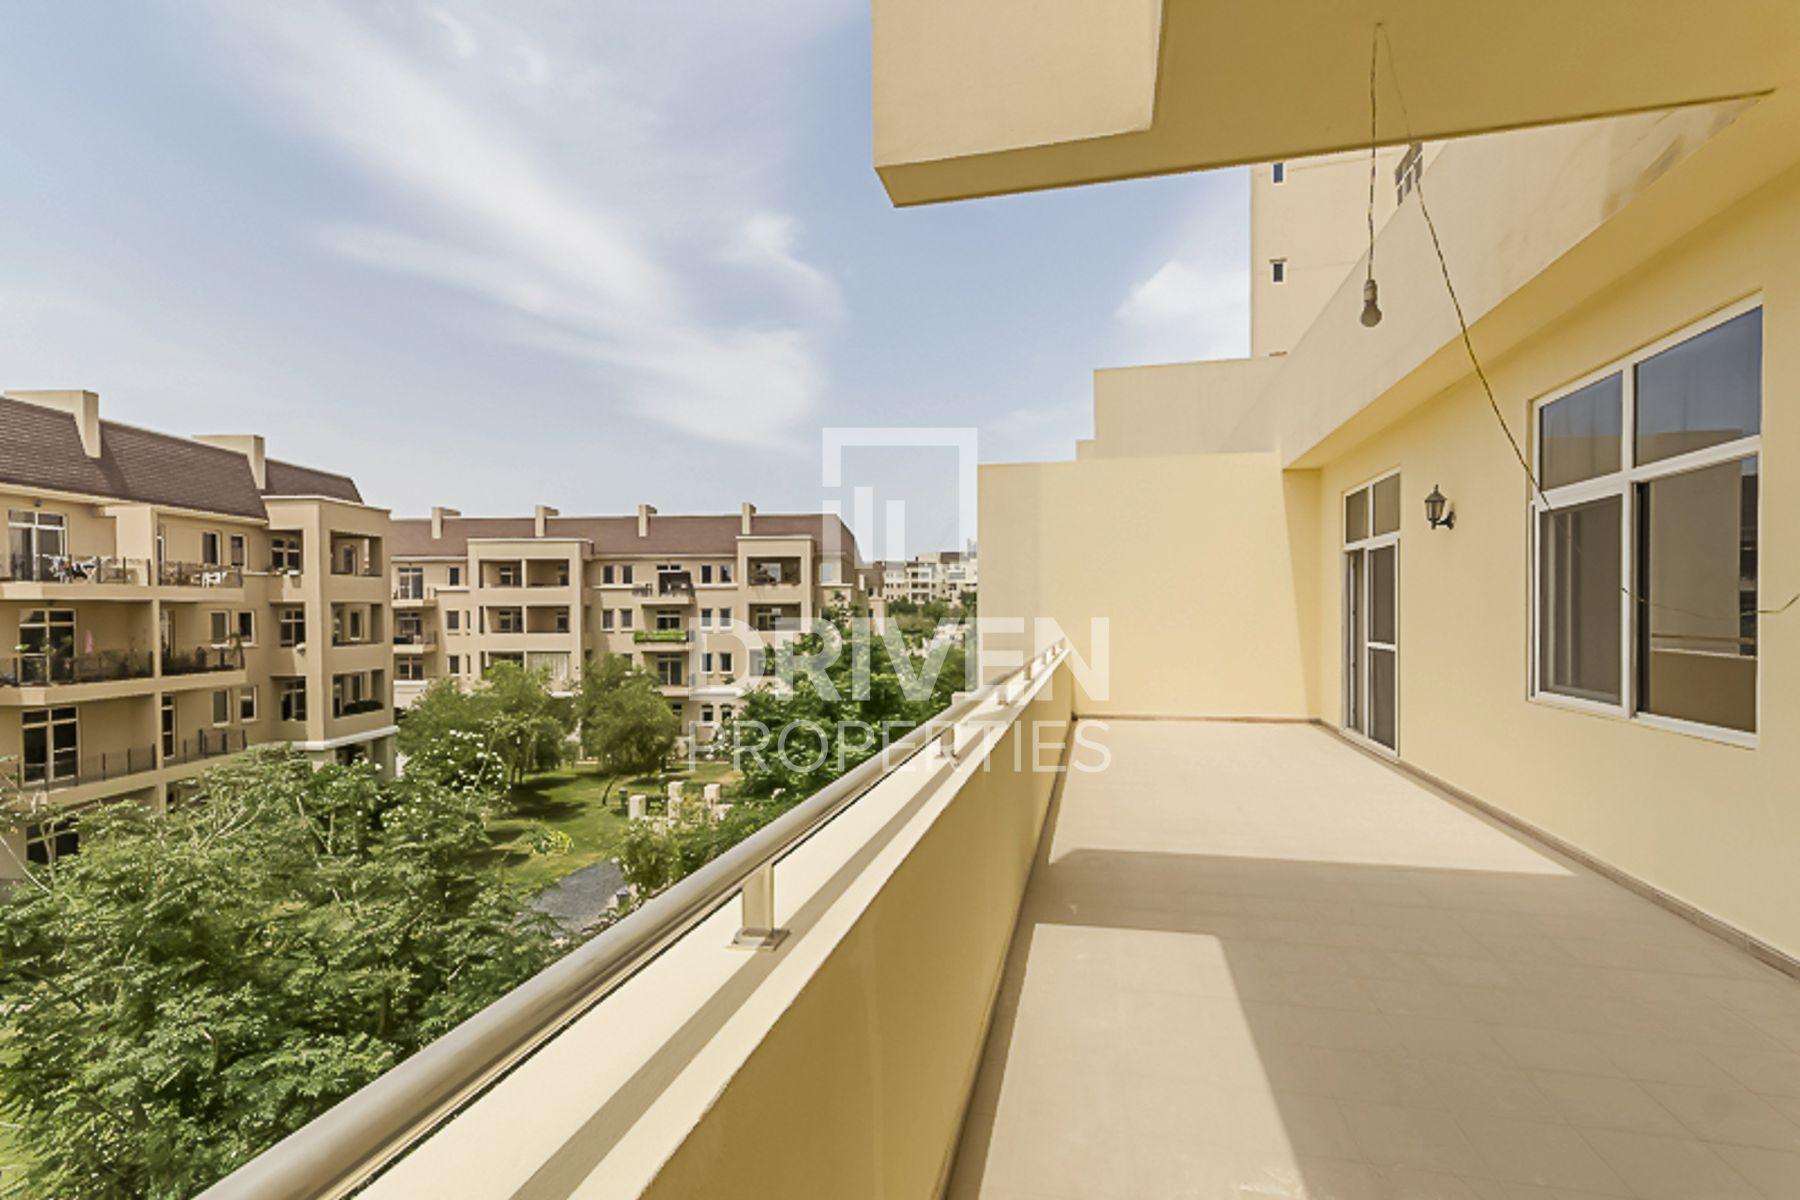 Apartment for Sale in New Bridge Hills 3 - Motor City